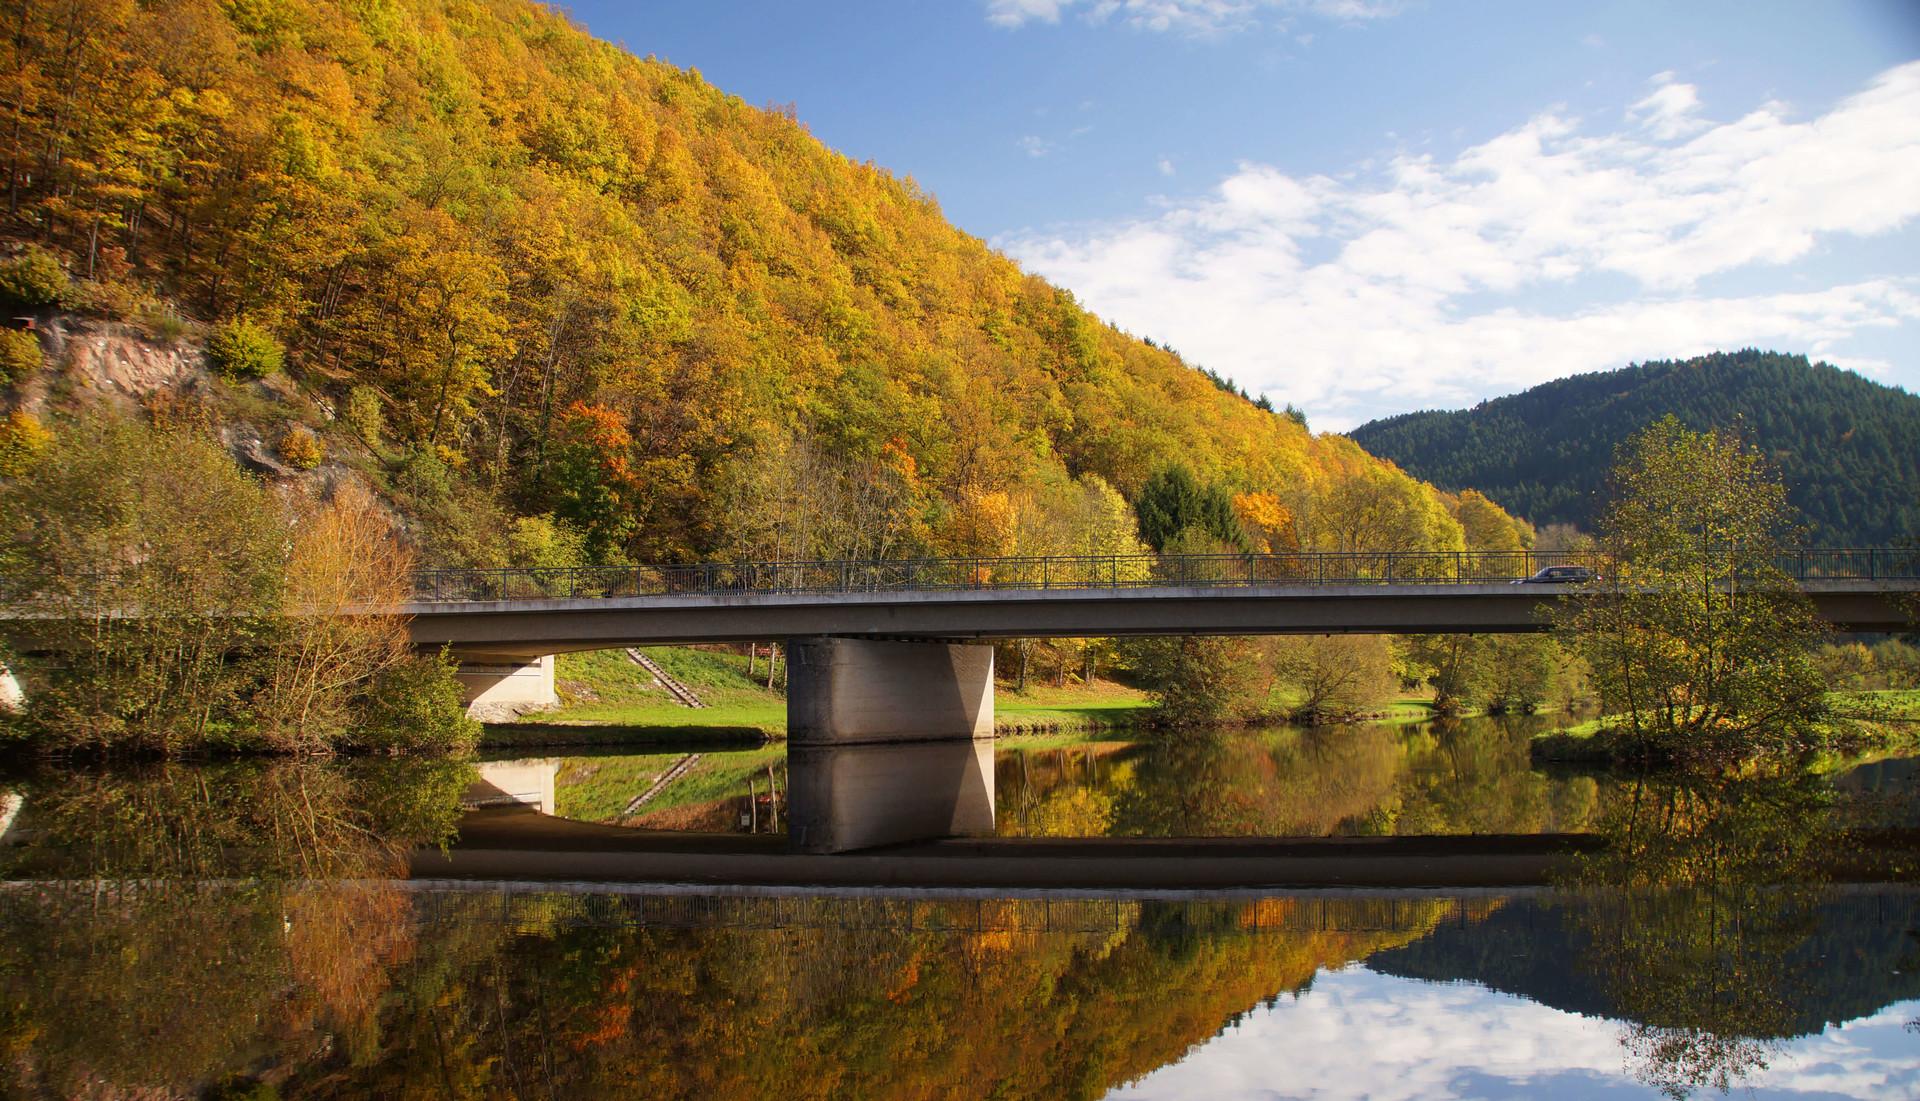 Kinzigbrücke bei Steinach im Kinzigtal